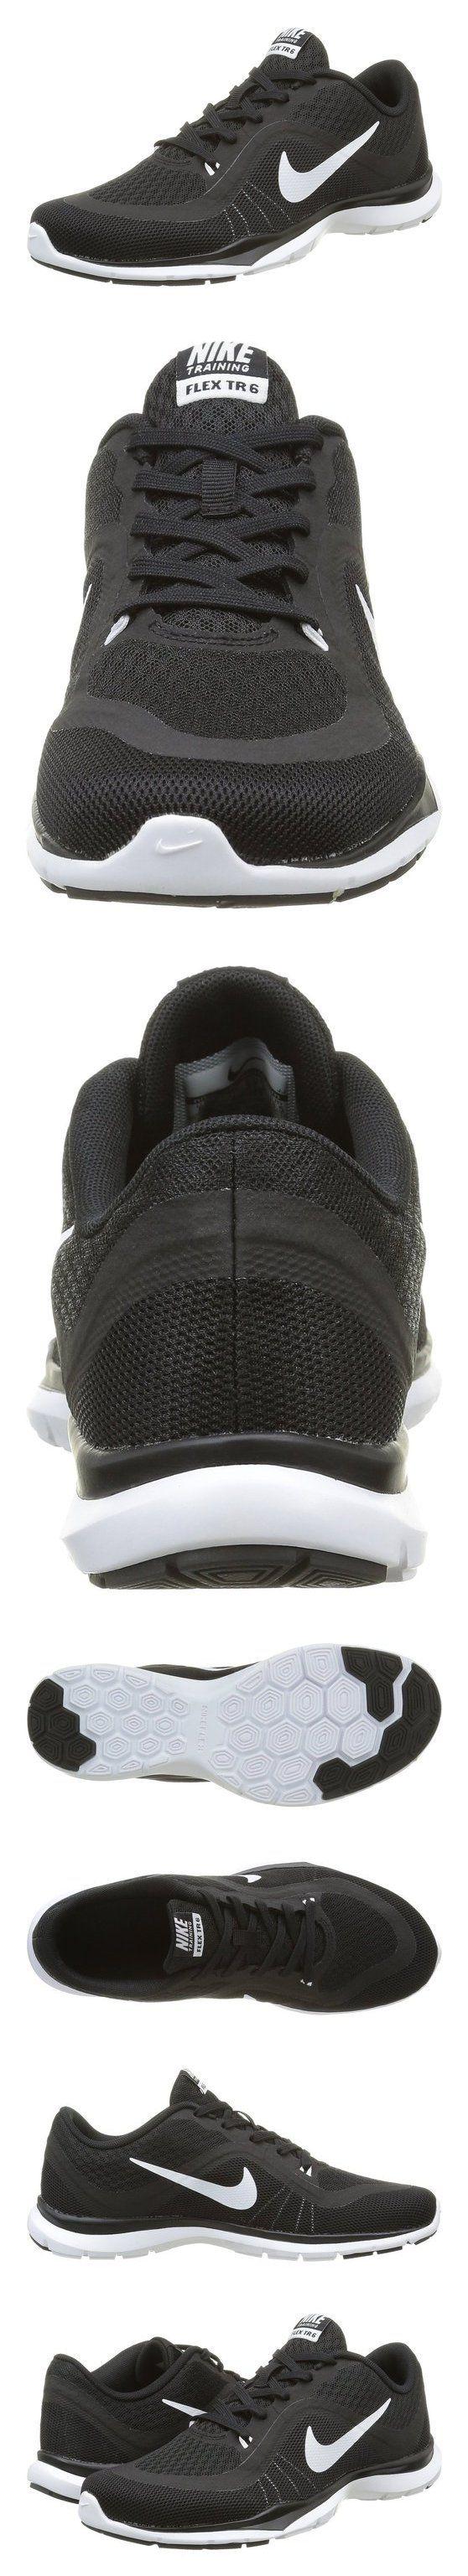 $70 - Nike Women's Flex Trainer 6 Black/White Training Shoe 5.5 #shoes #nike #2011